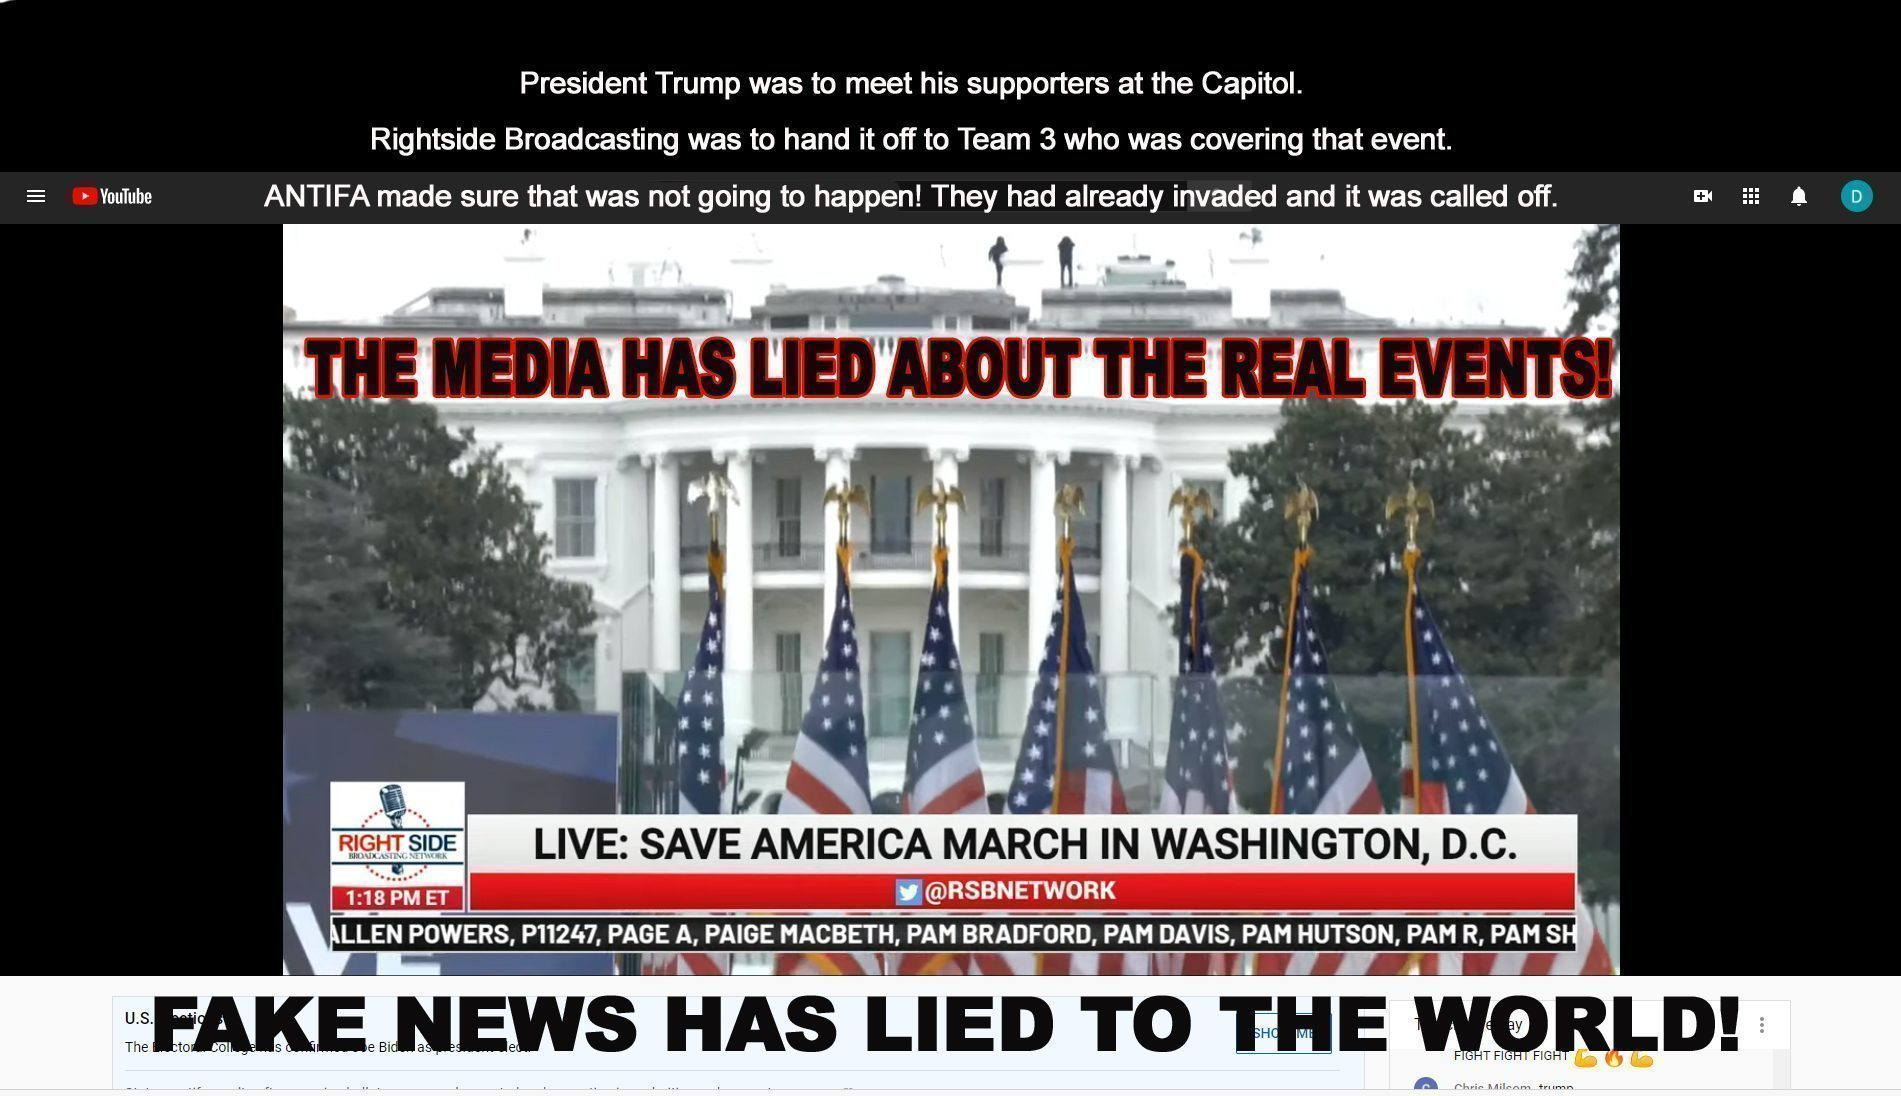 fake news again